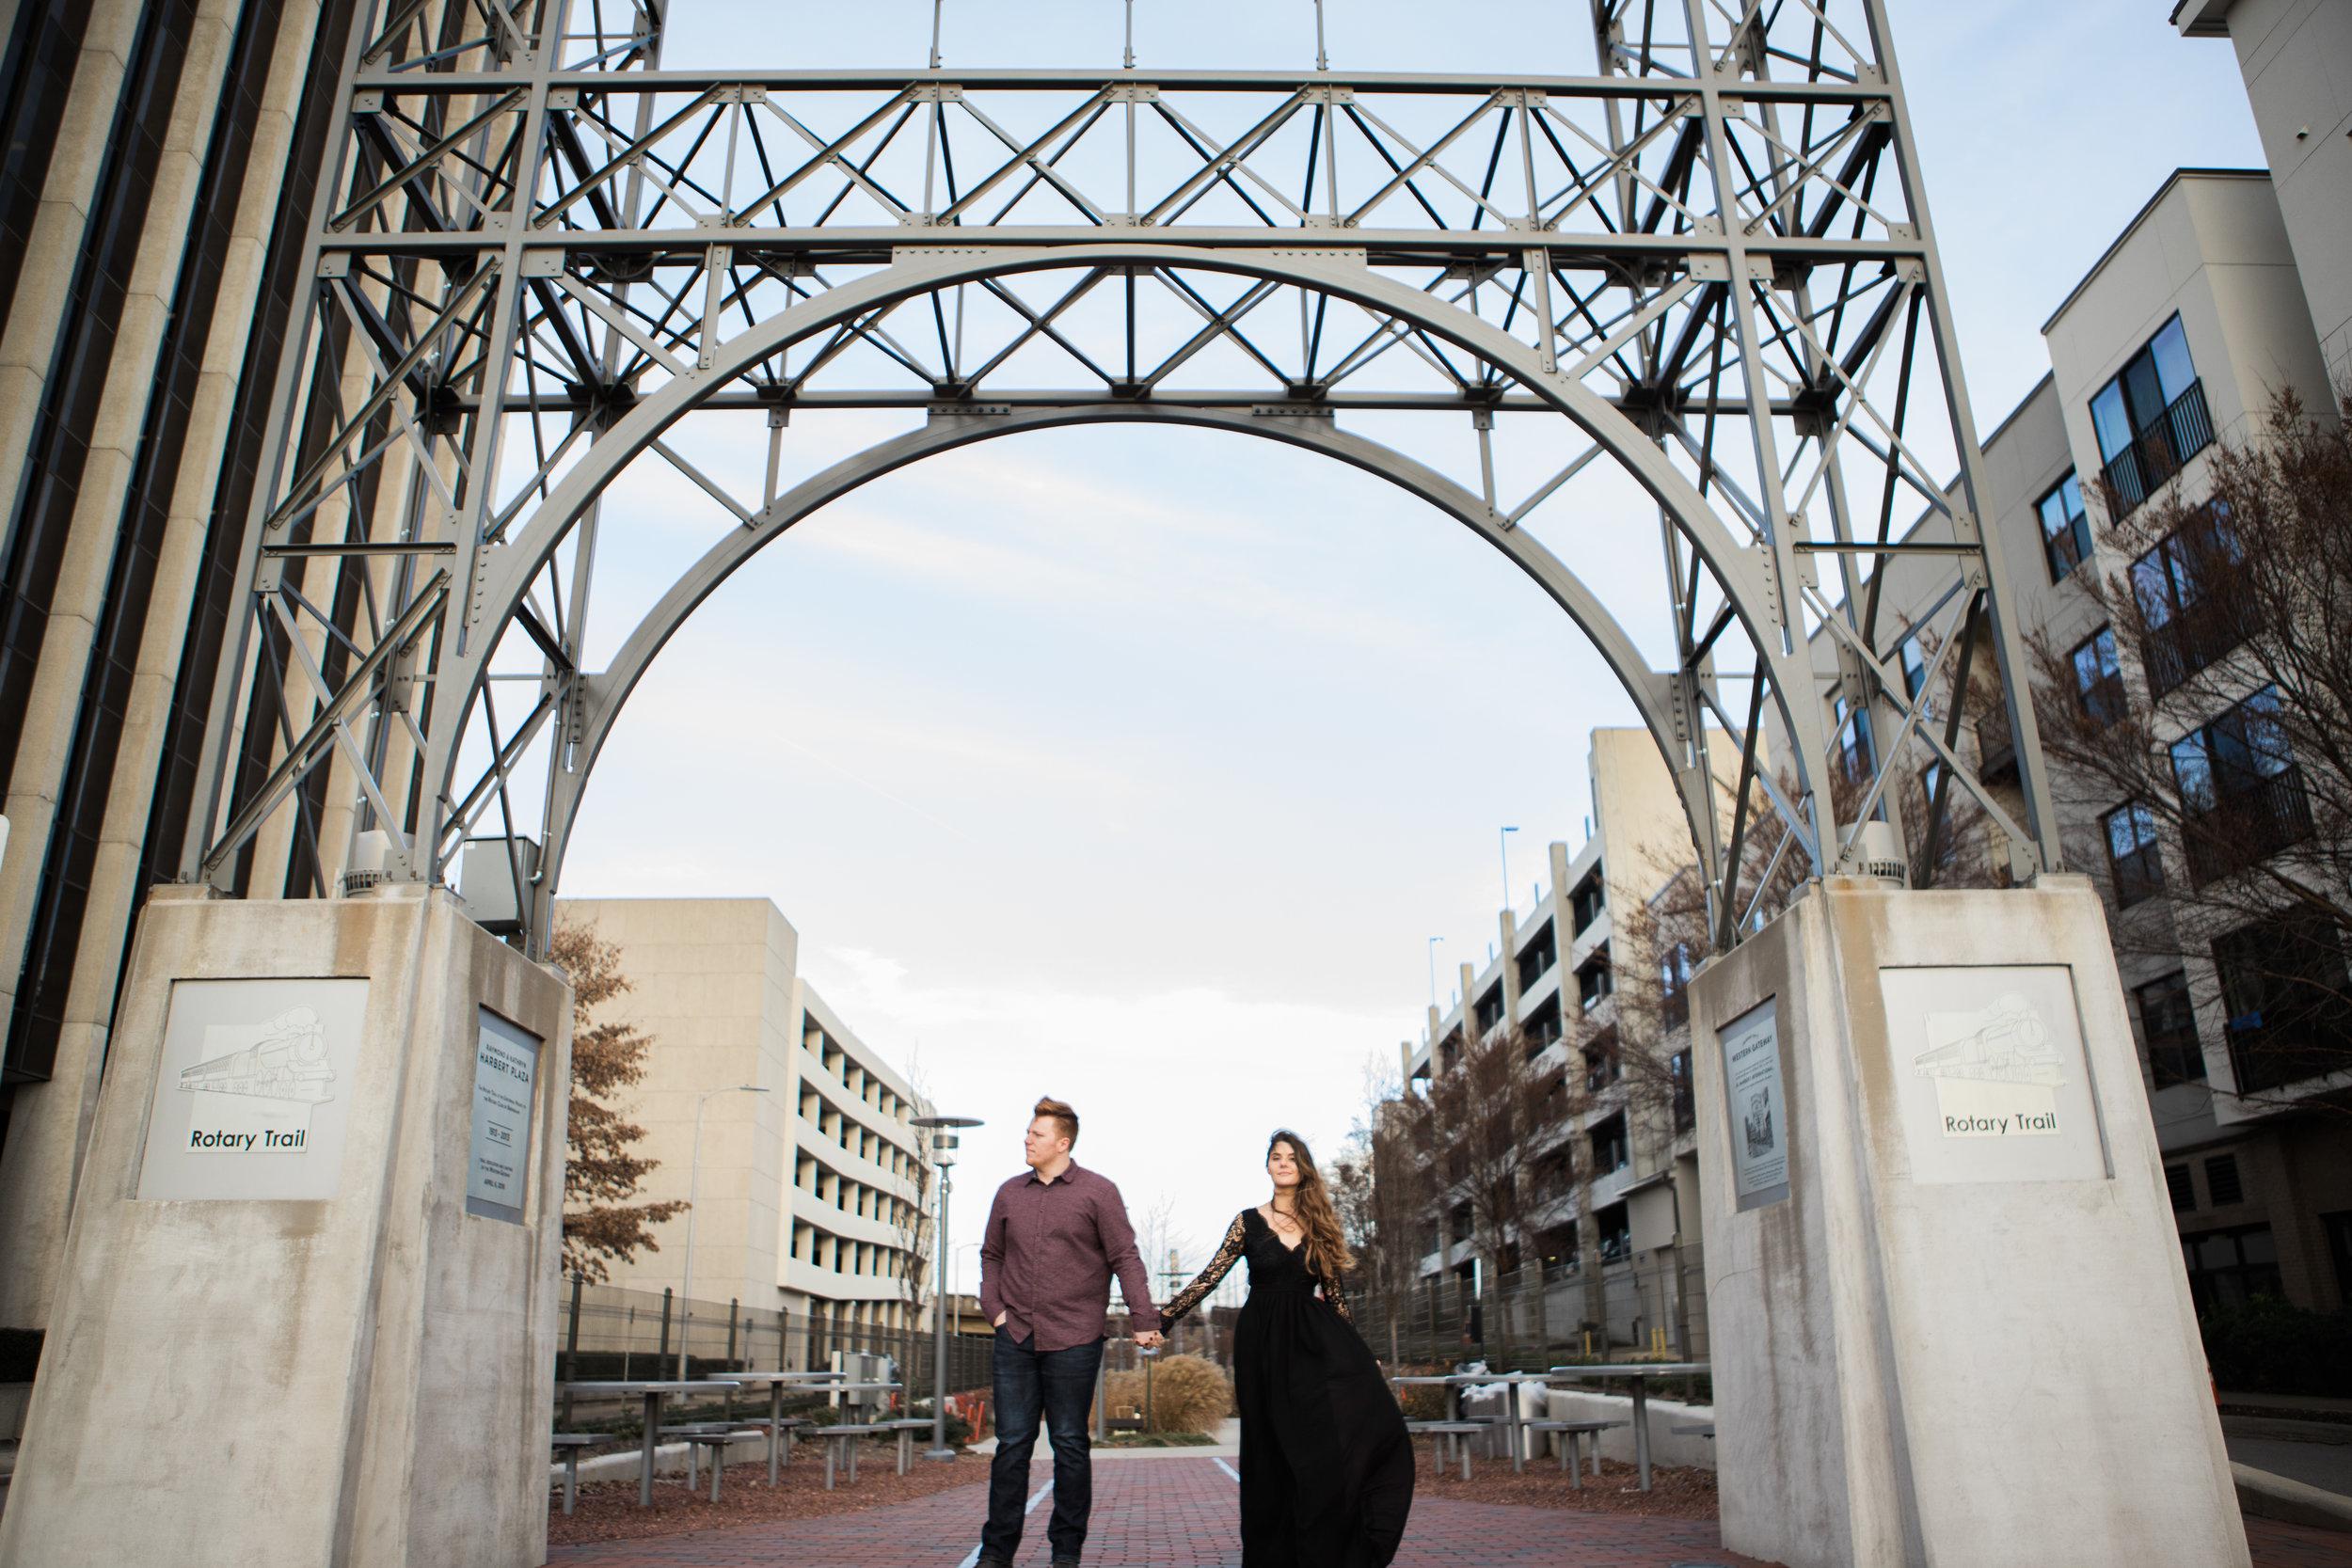 Engagement Photography | Rotary Trail | Birmingham, AL